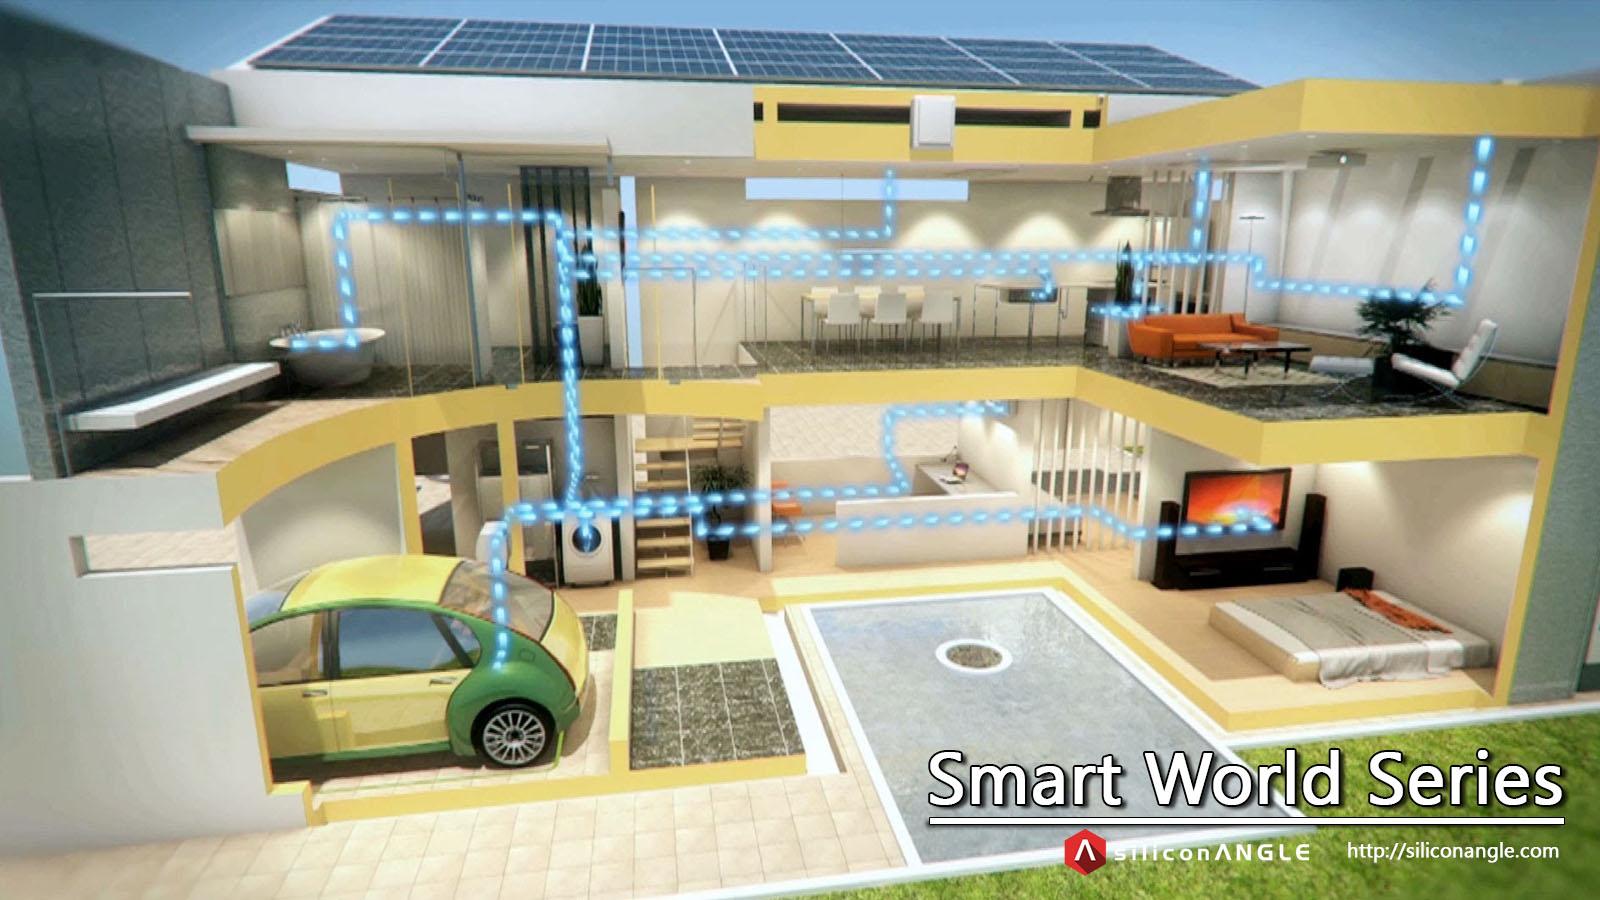 Smart World Series with SiliconANGLE